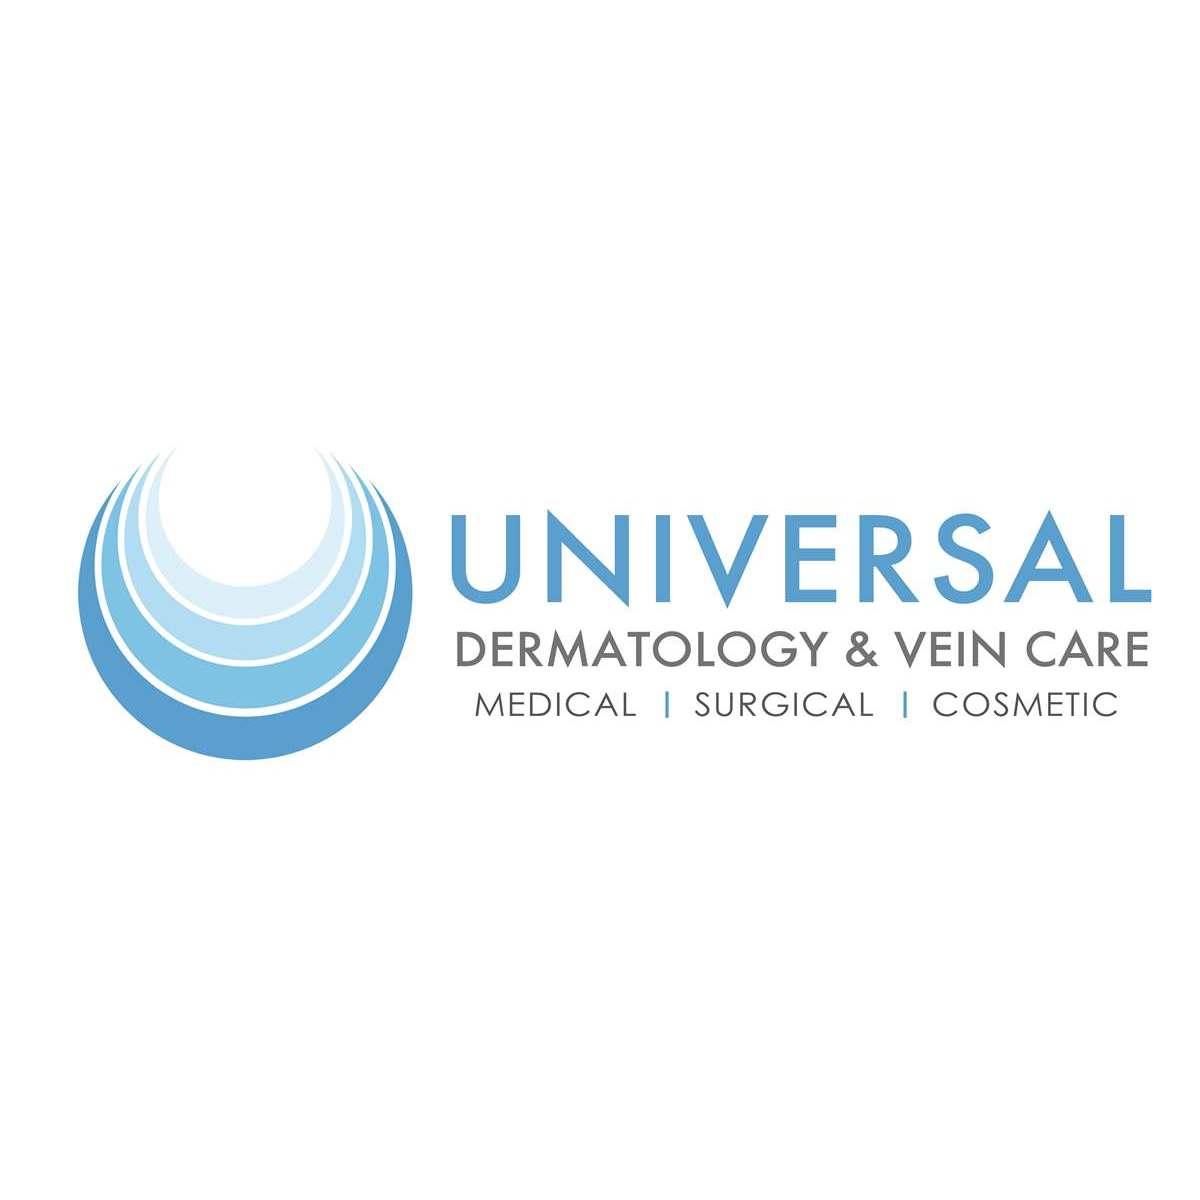 Universal Dermatology & Vein Care: Dr. George Skandamis - Mount Vernon, OH - Dermatologists